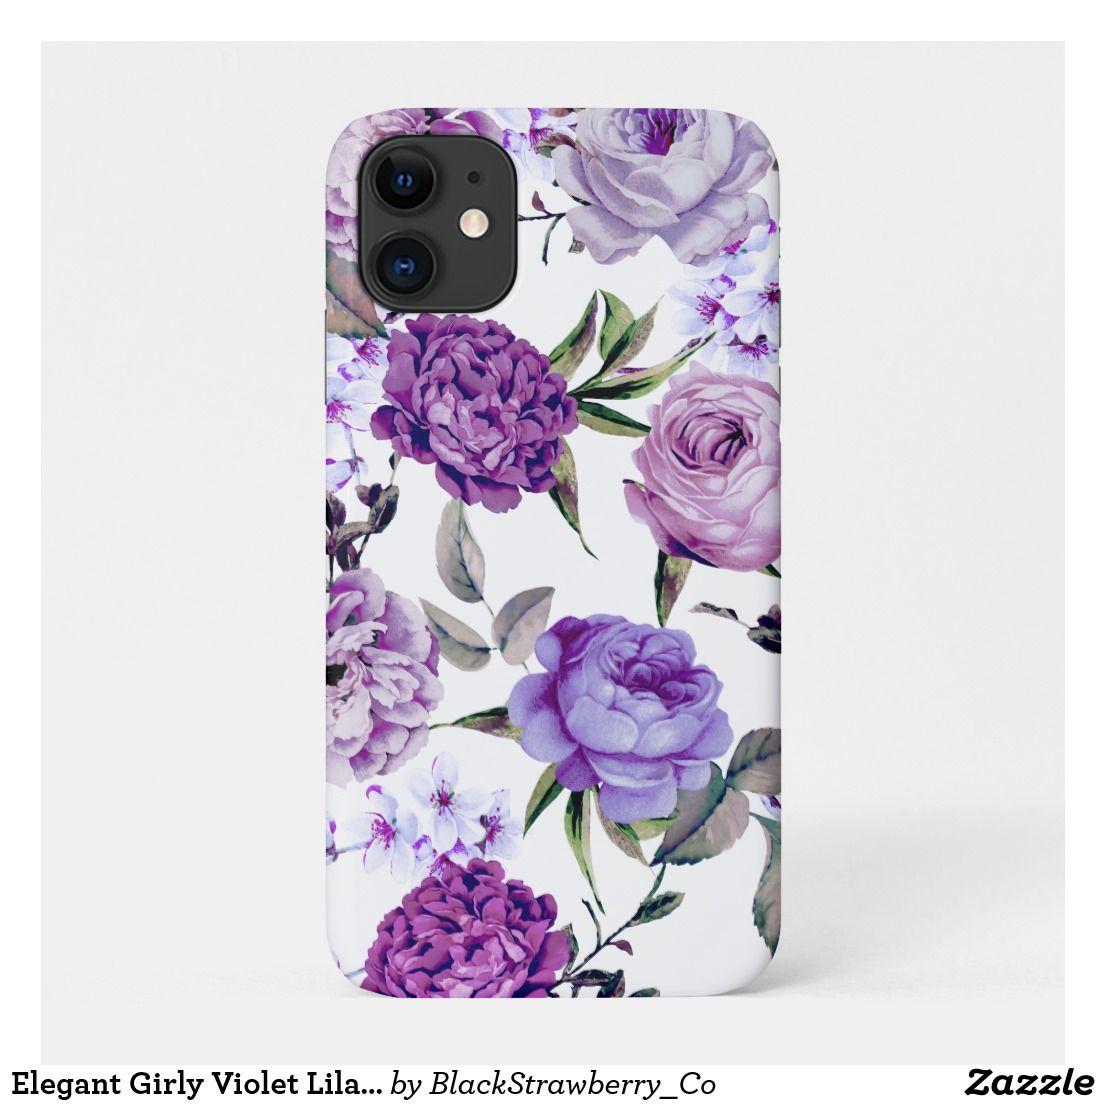 Elegant girly violet lilac purple flowers casemate iphone